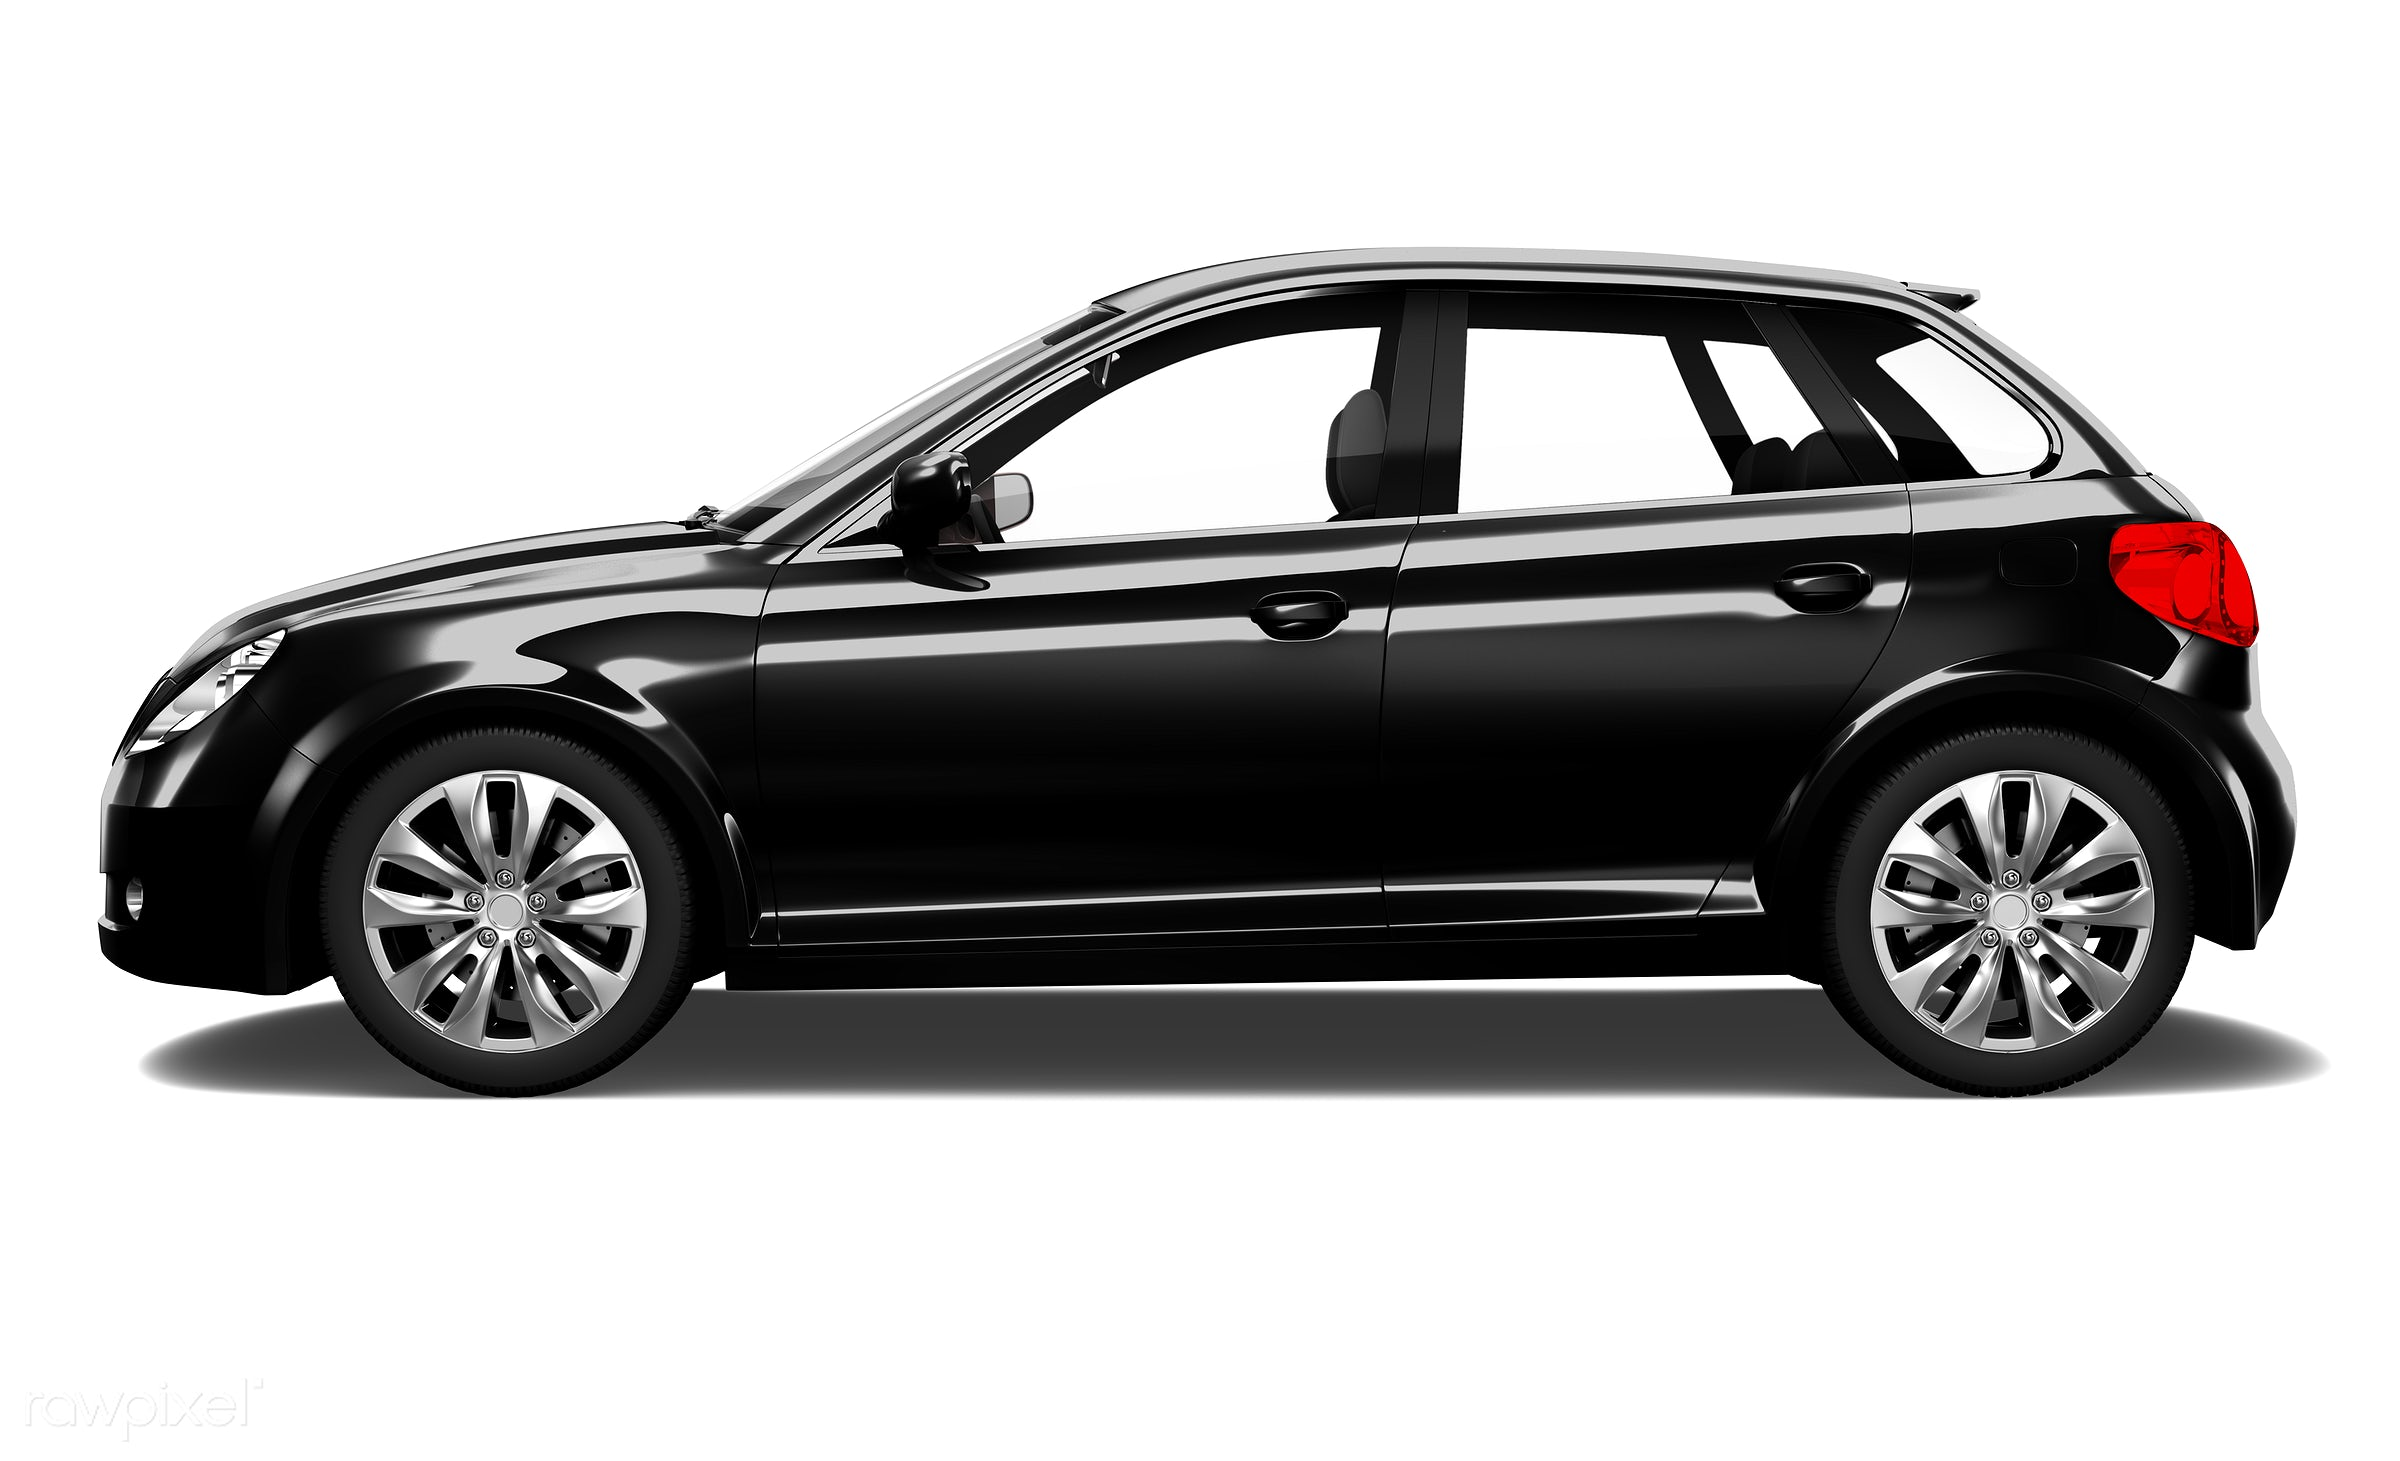 Three dimensional image of car - 3d, automobile, automotive, black, brandless, car, concept car, graphic, hatchback, holiday...